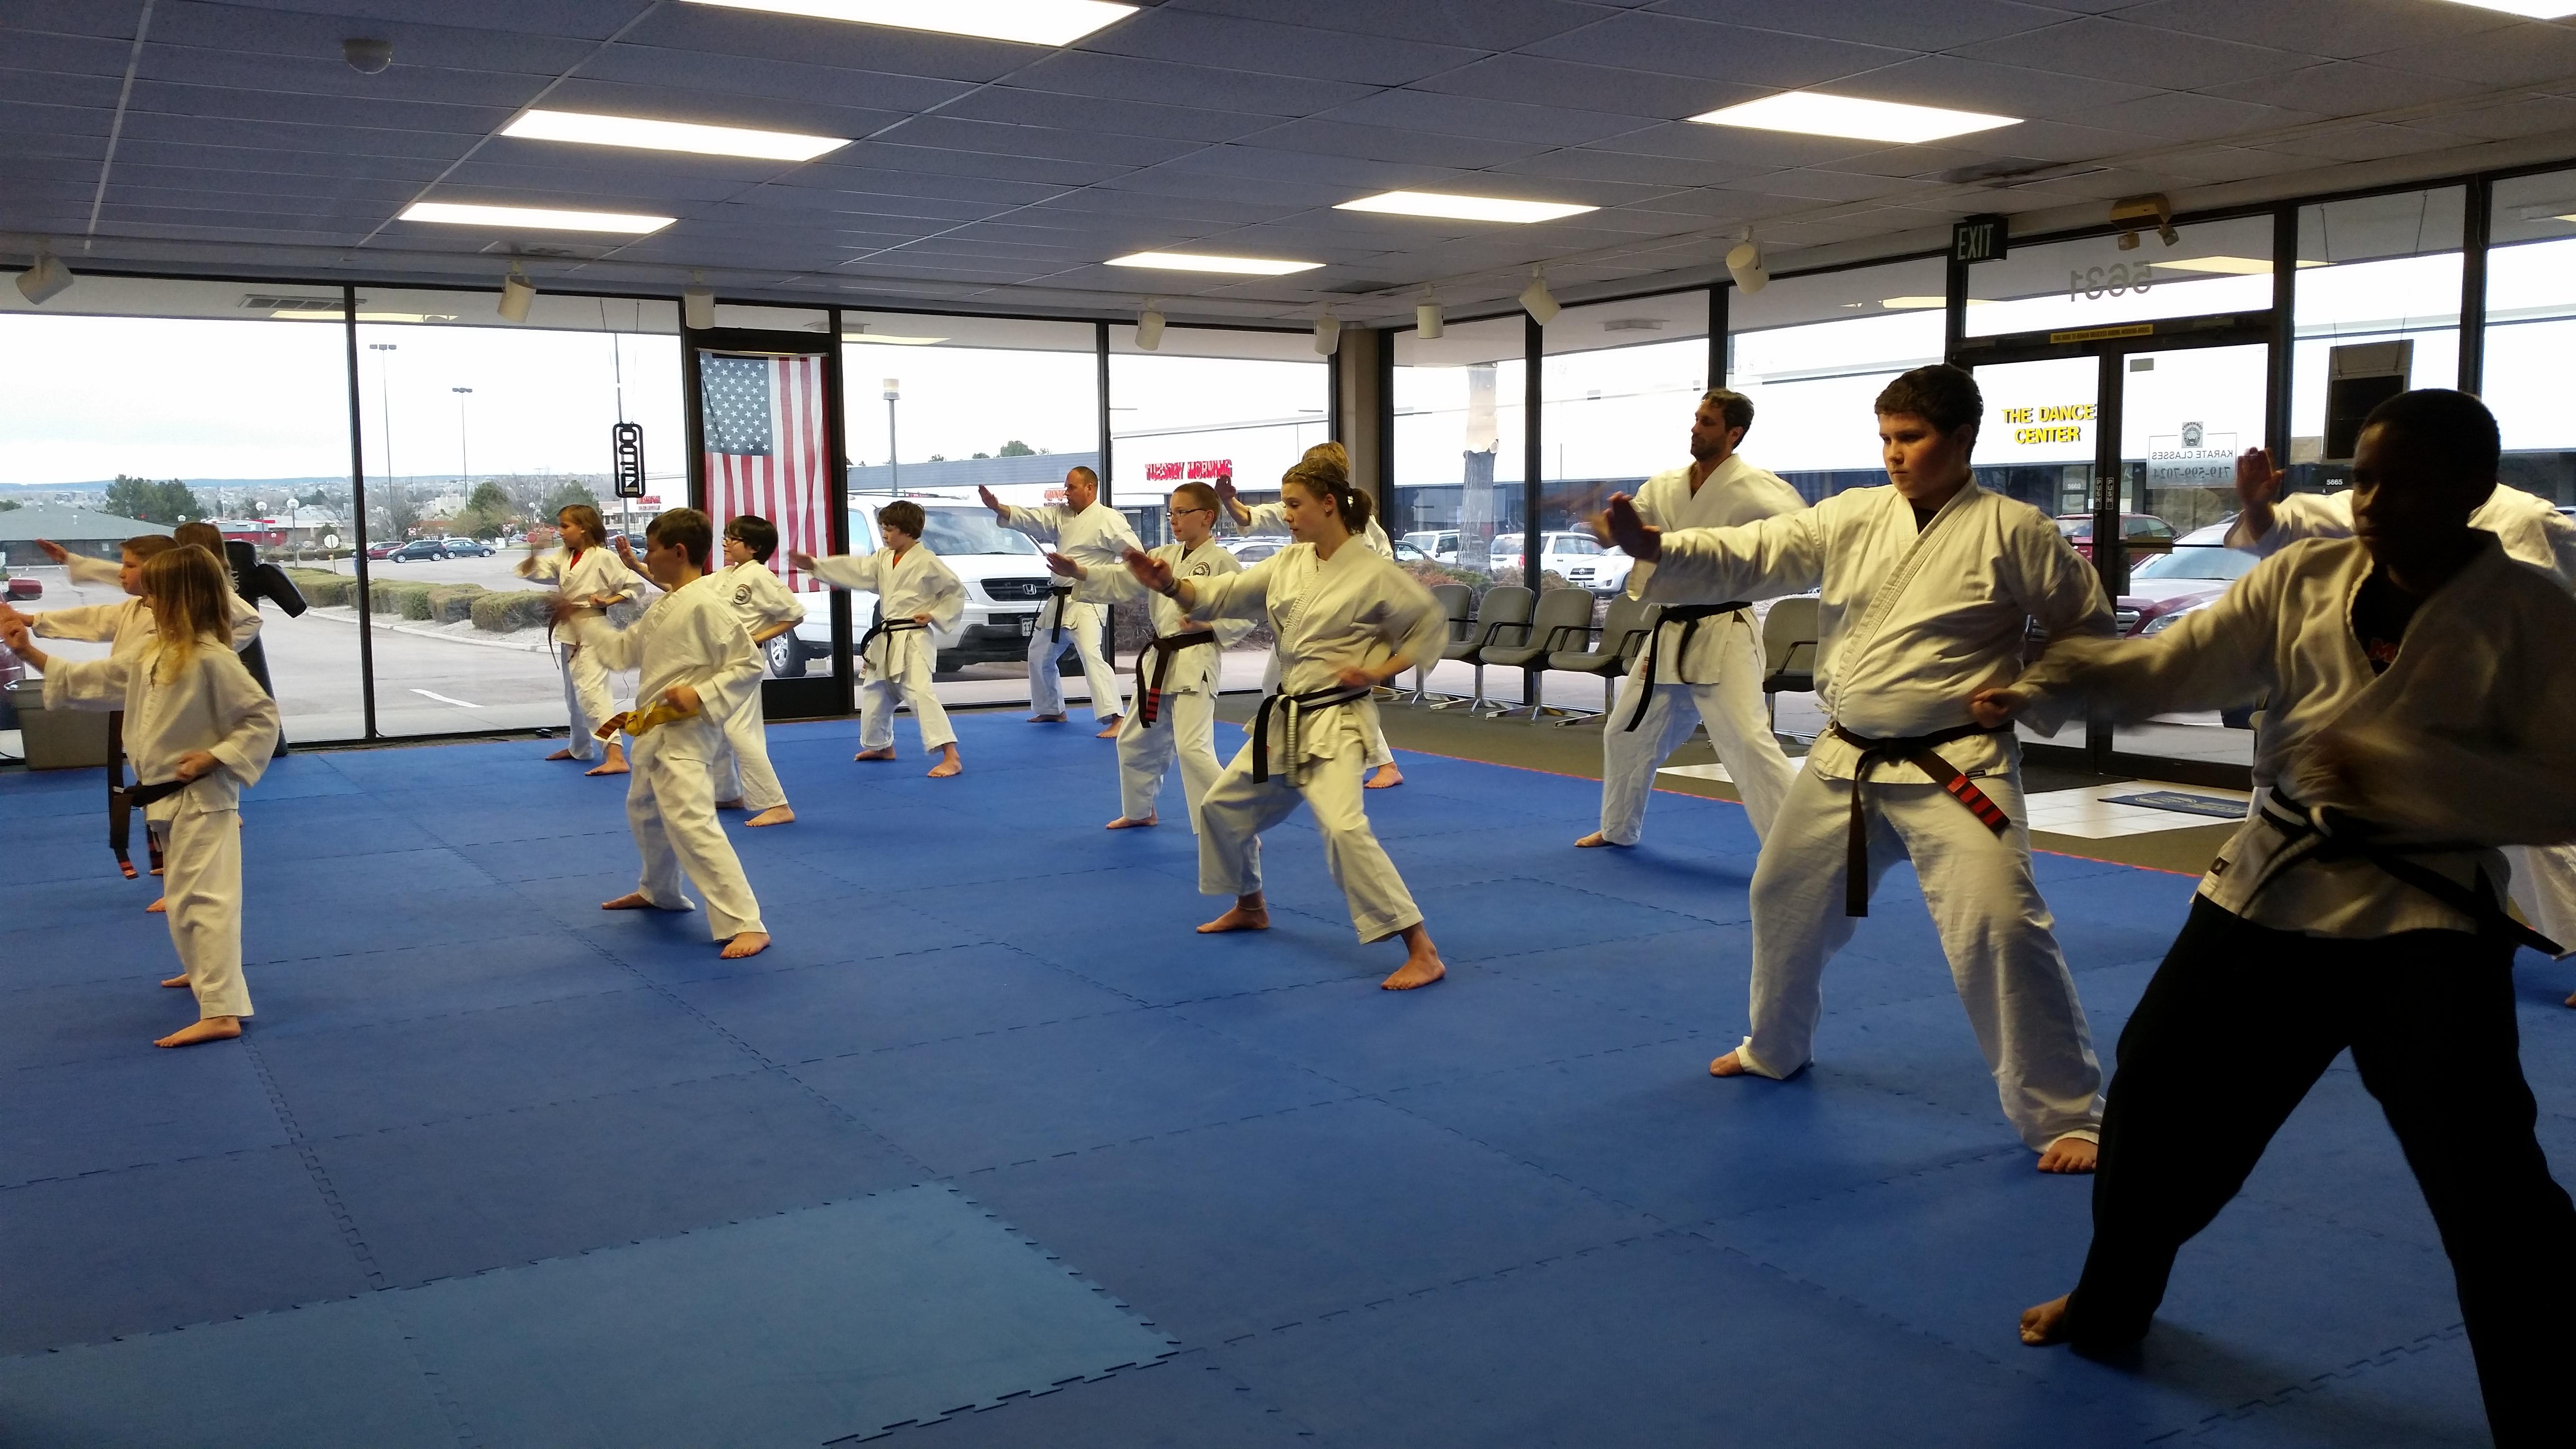 colorado springs adult community education classes